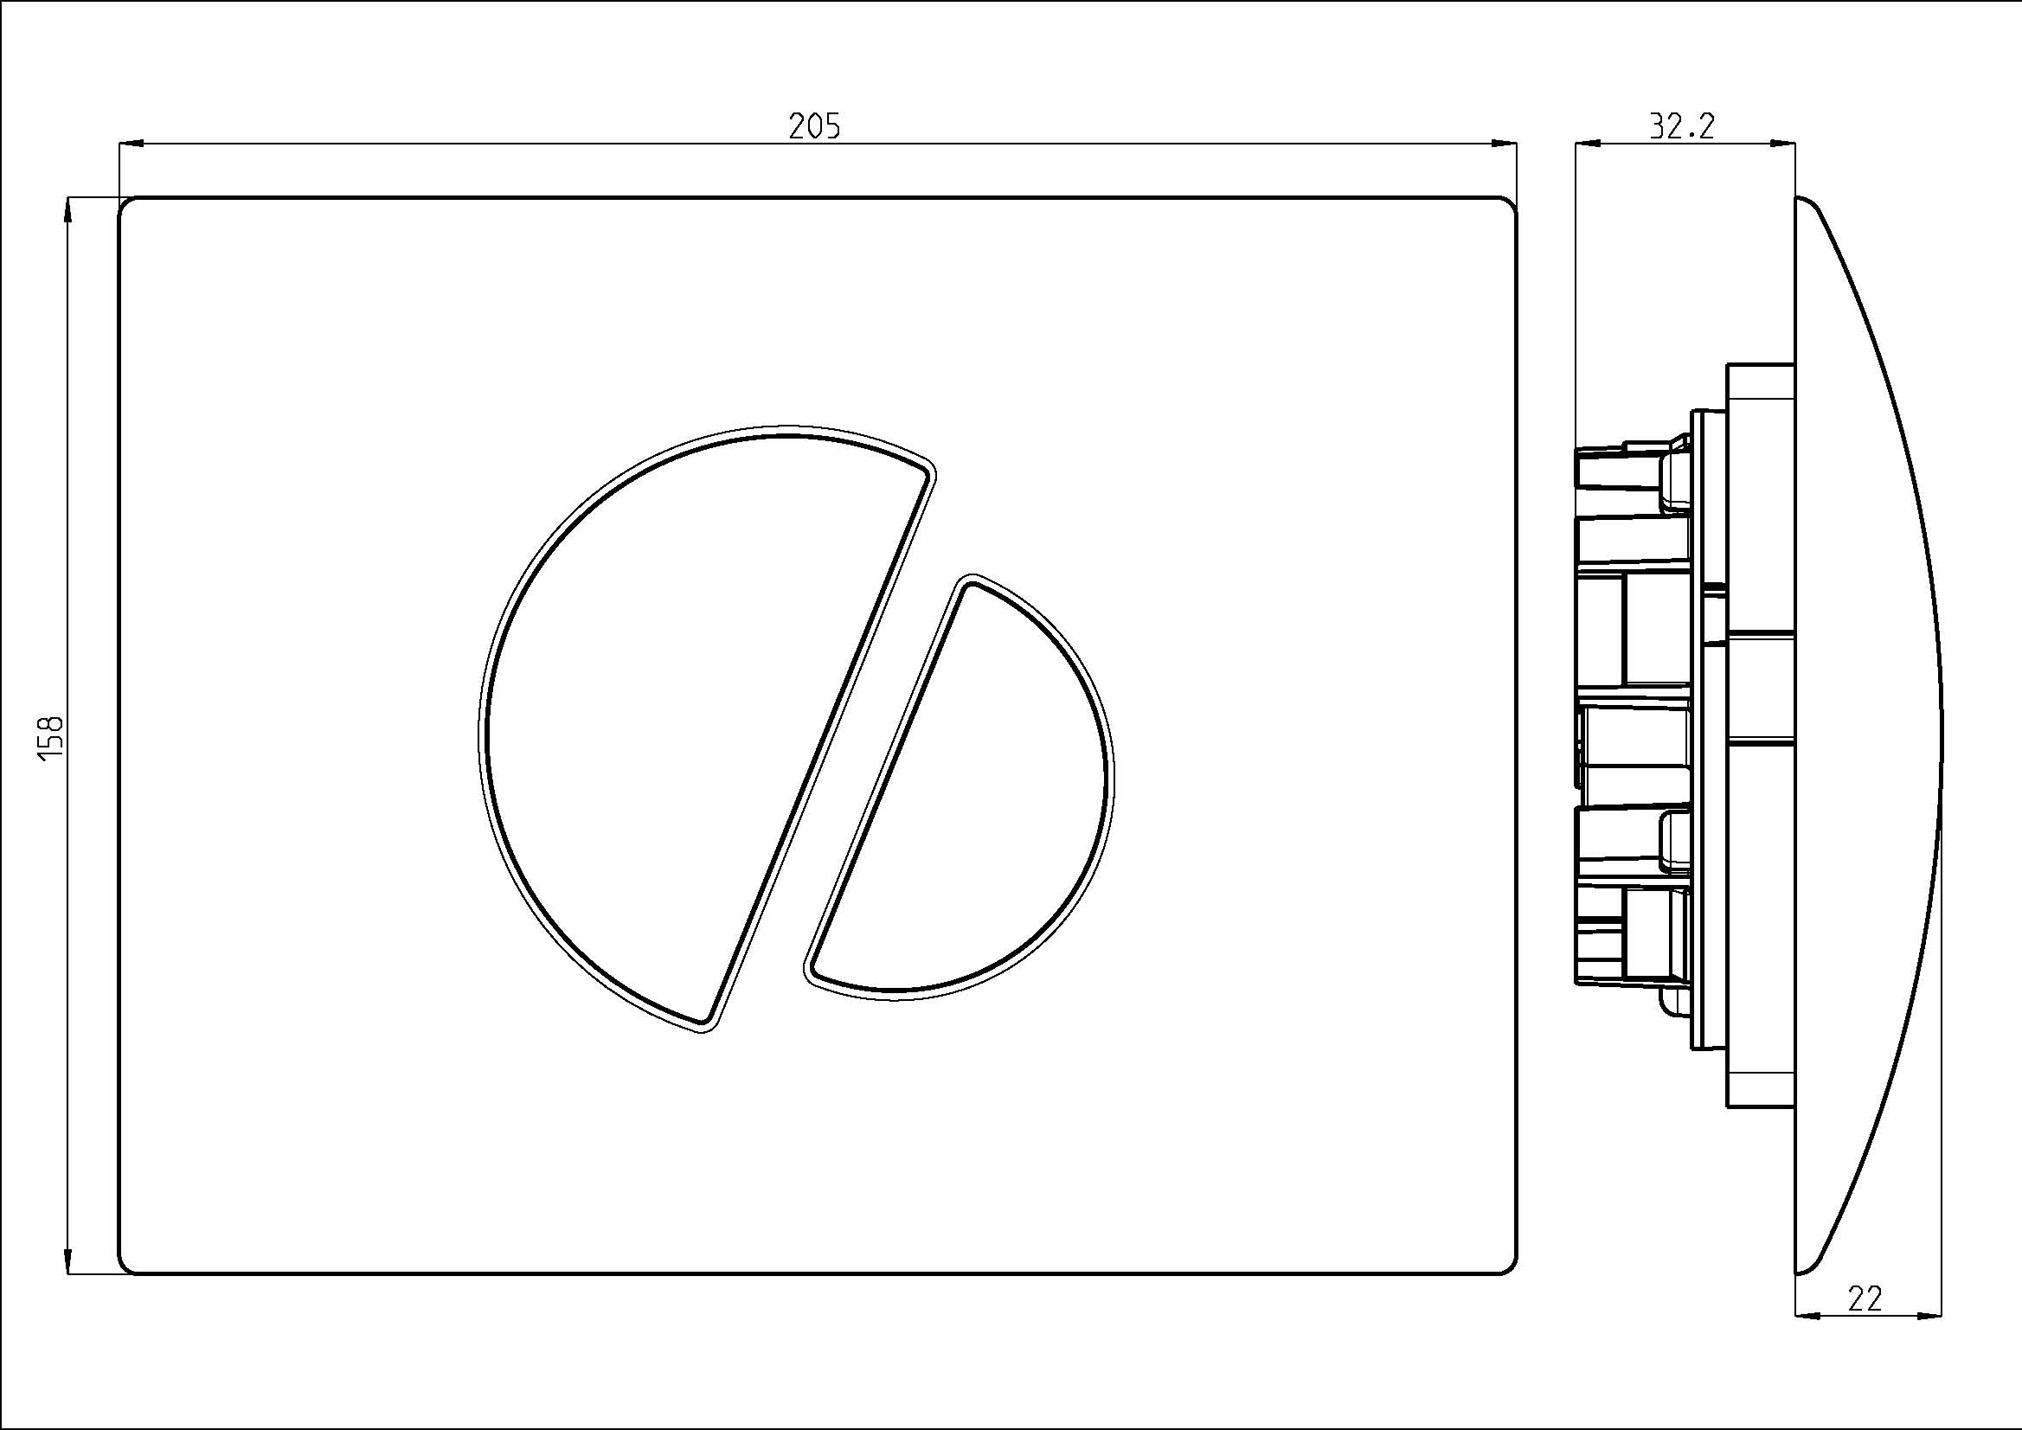 badshop veith bet tigungsplatte go verchromt f 2 mengen sp ltechnik vigour sanibel. Black Bedroom Furniture Sets. Home Design Ideas